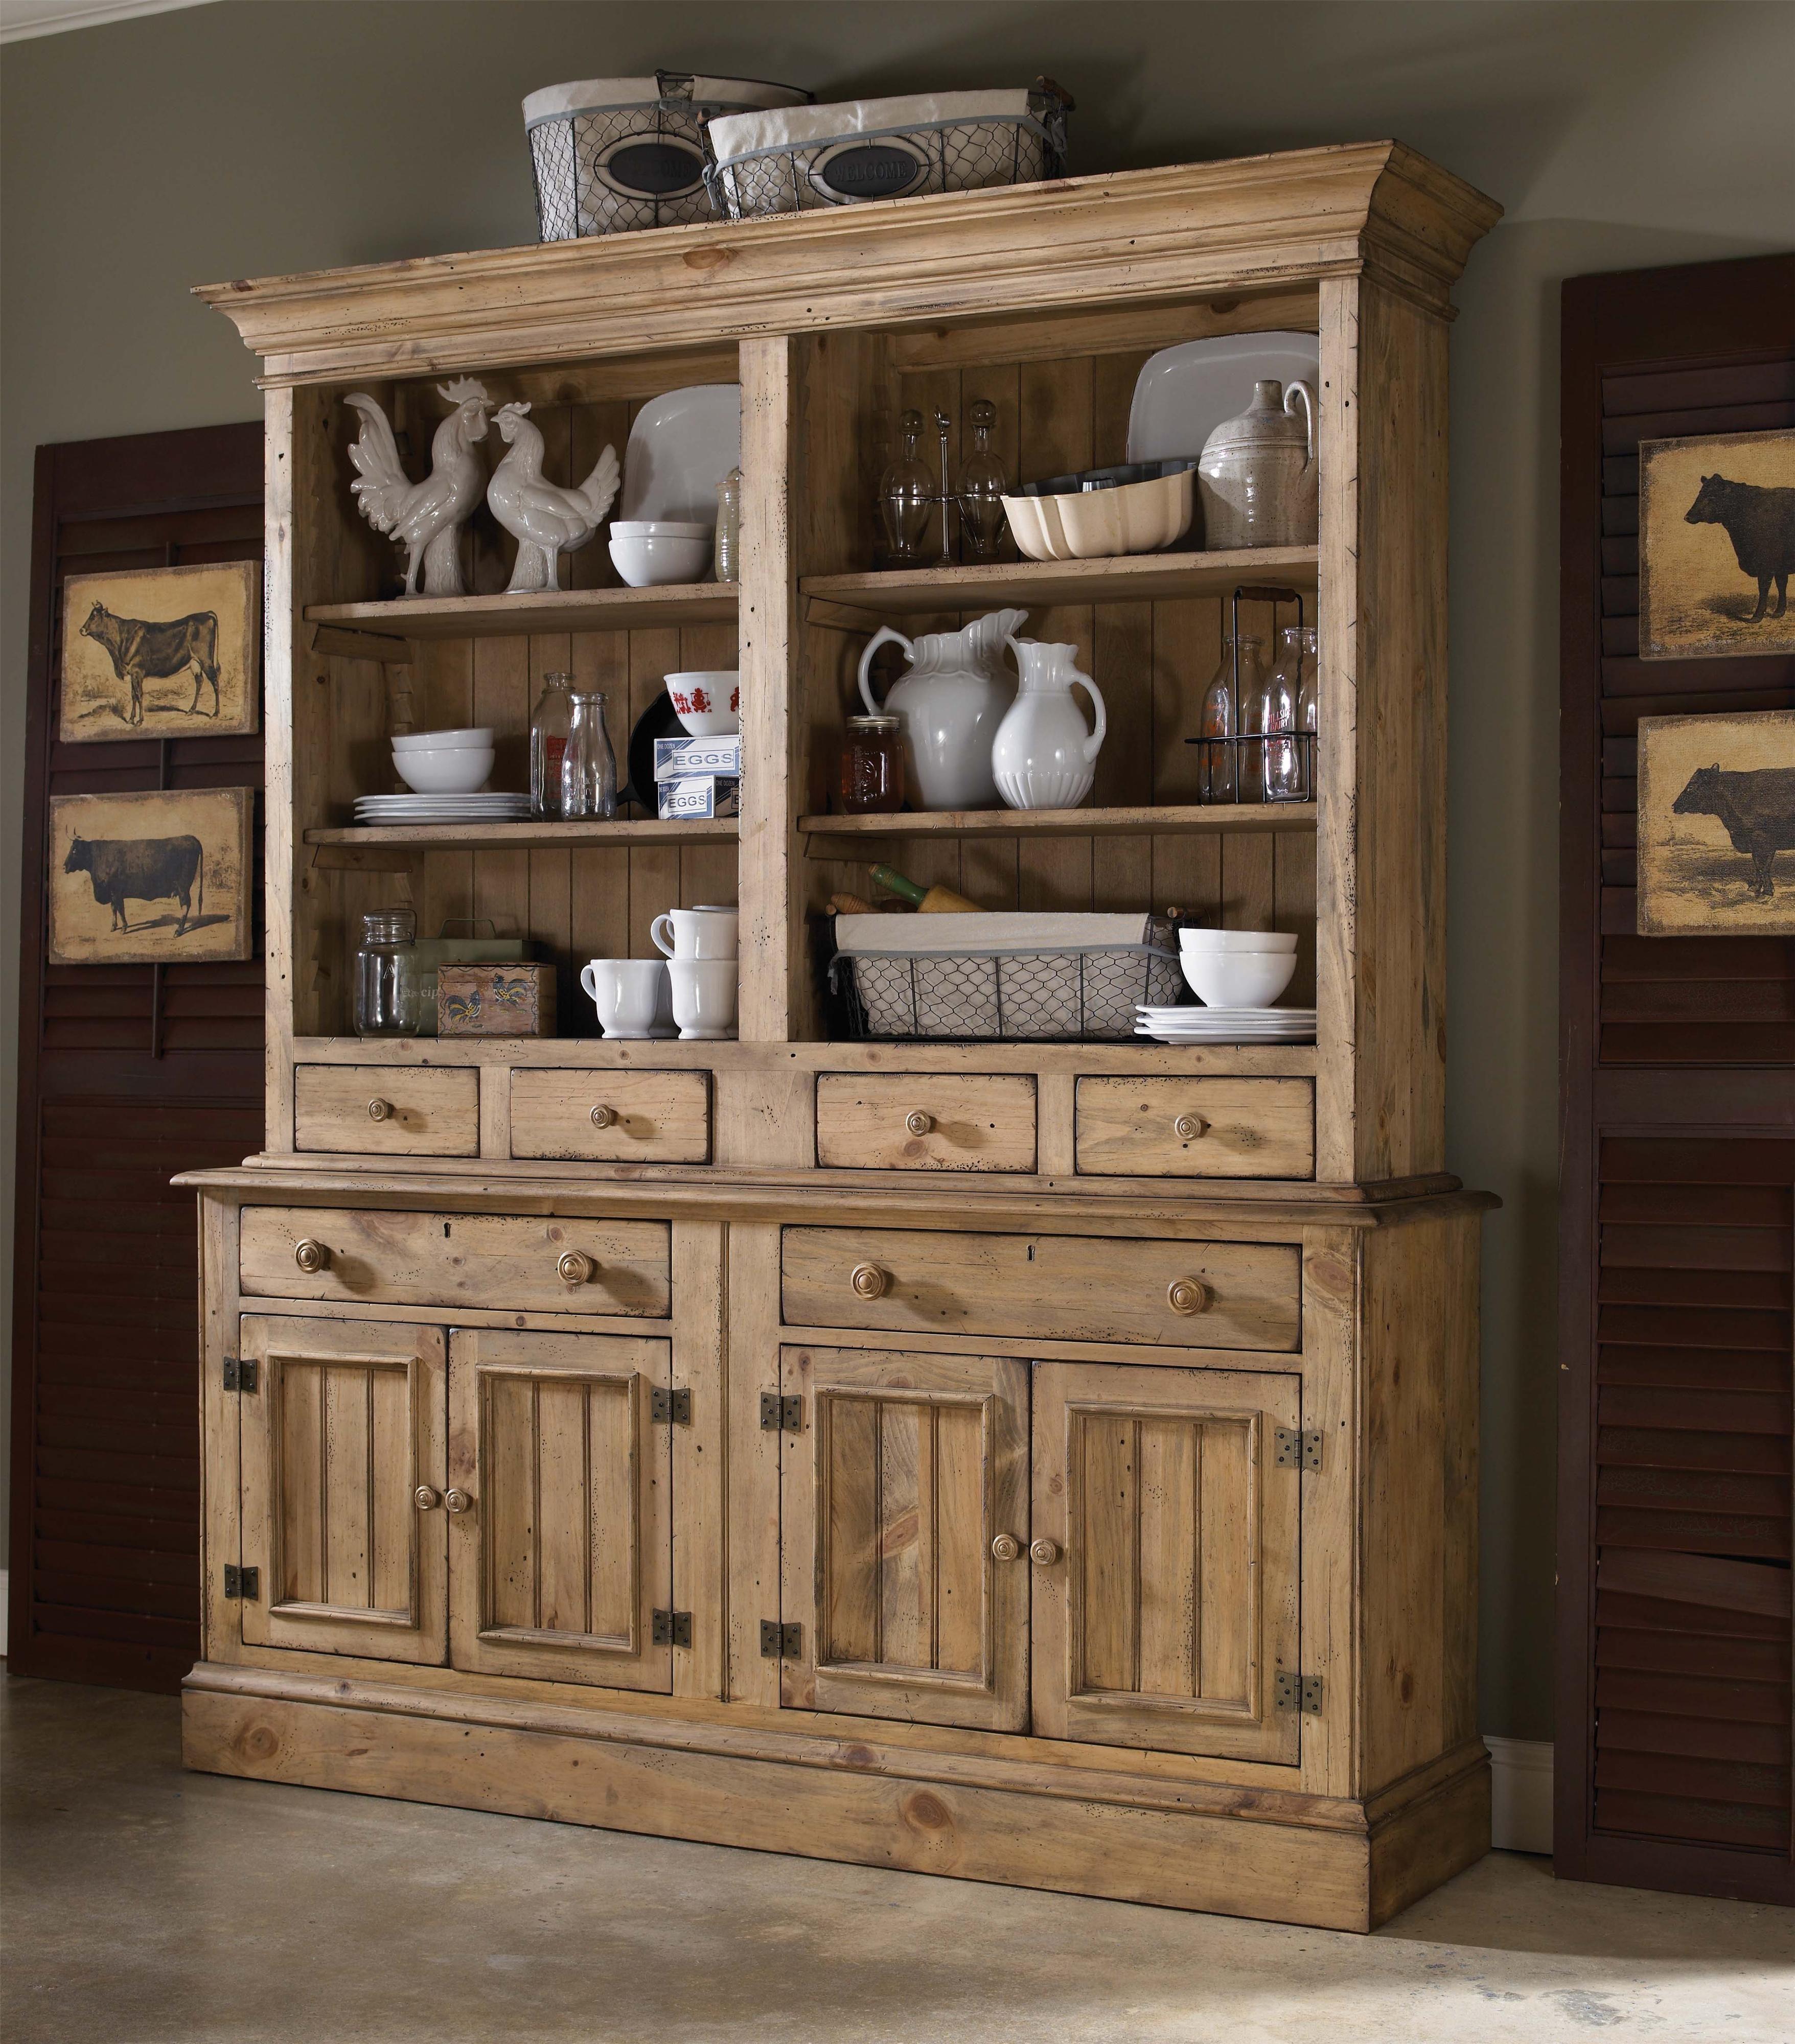 Farmhouse Furniture Wood Kincaid Buffet Hutch China Cabinets Buffets Homecoming Dining Table Room